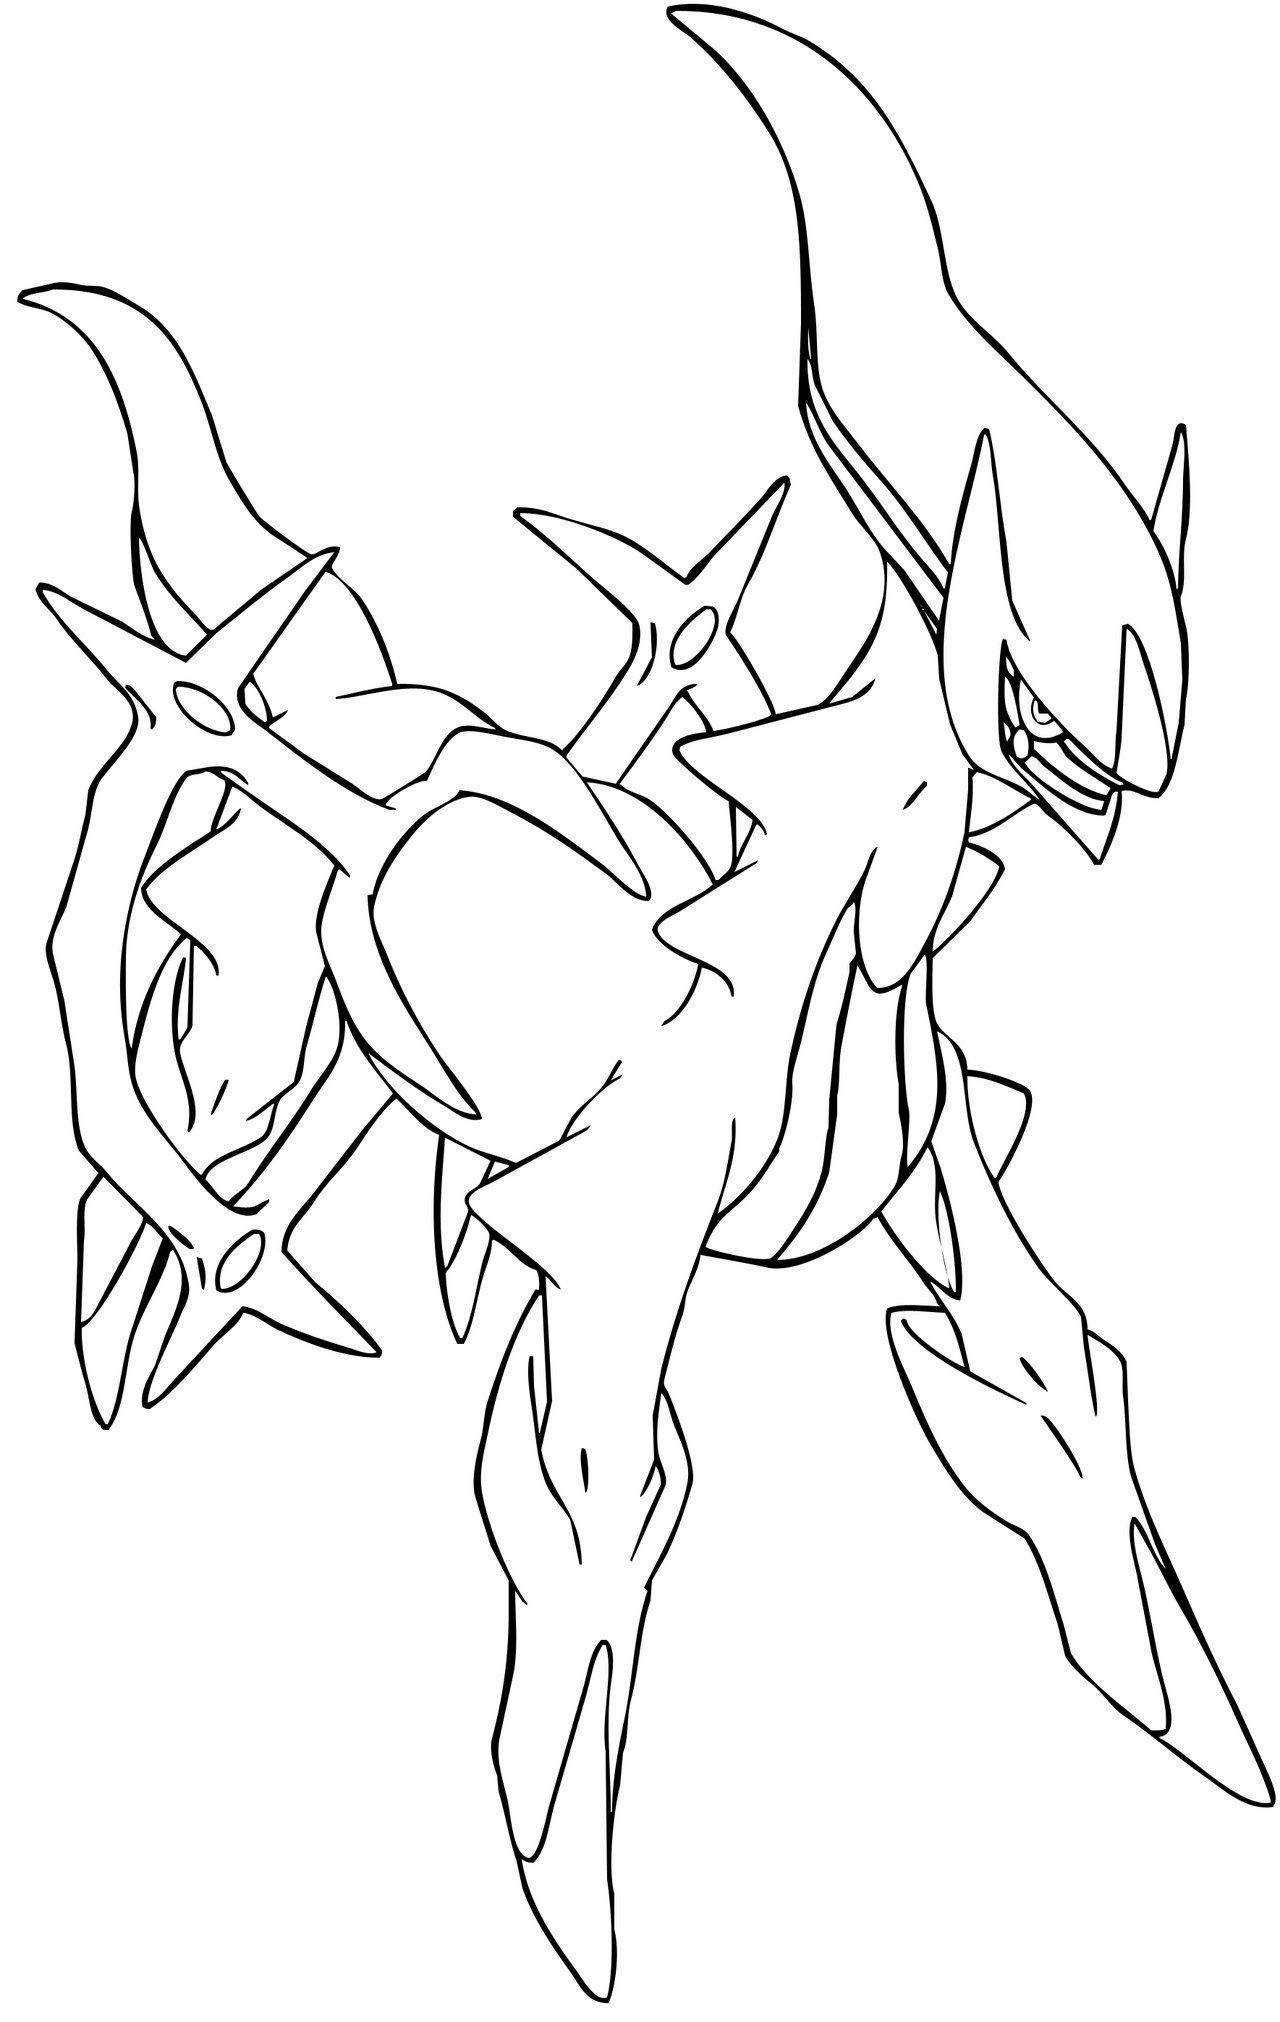 Arceus Pokemon Para Colorear Pagina Colorear Pokemon Dibujos Para Colorear Pokemon Paginas Para Colorear